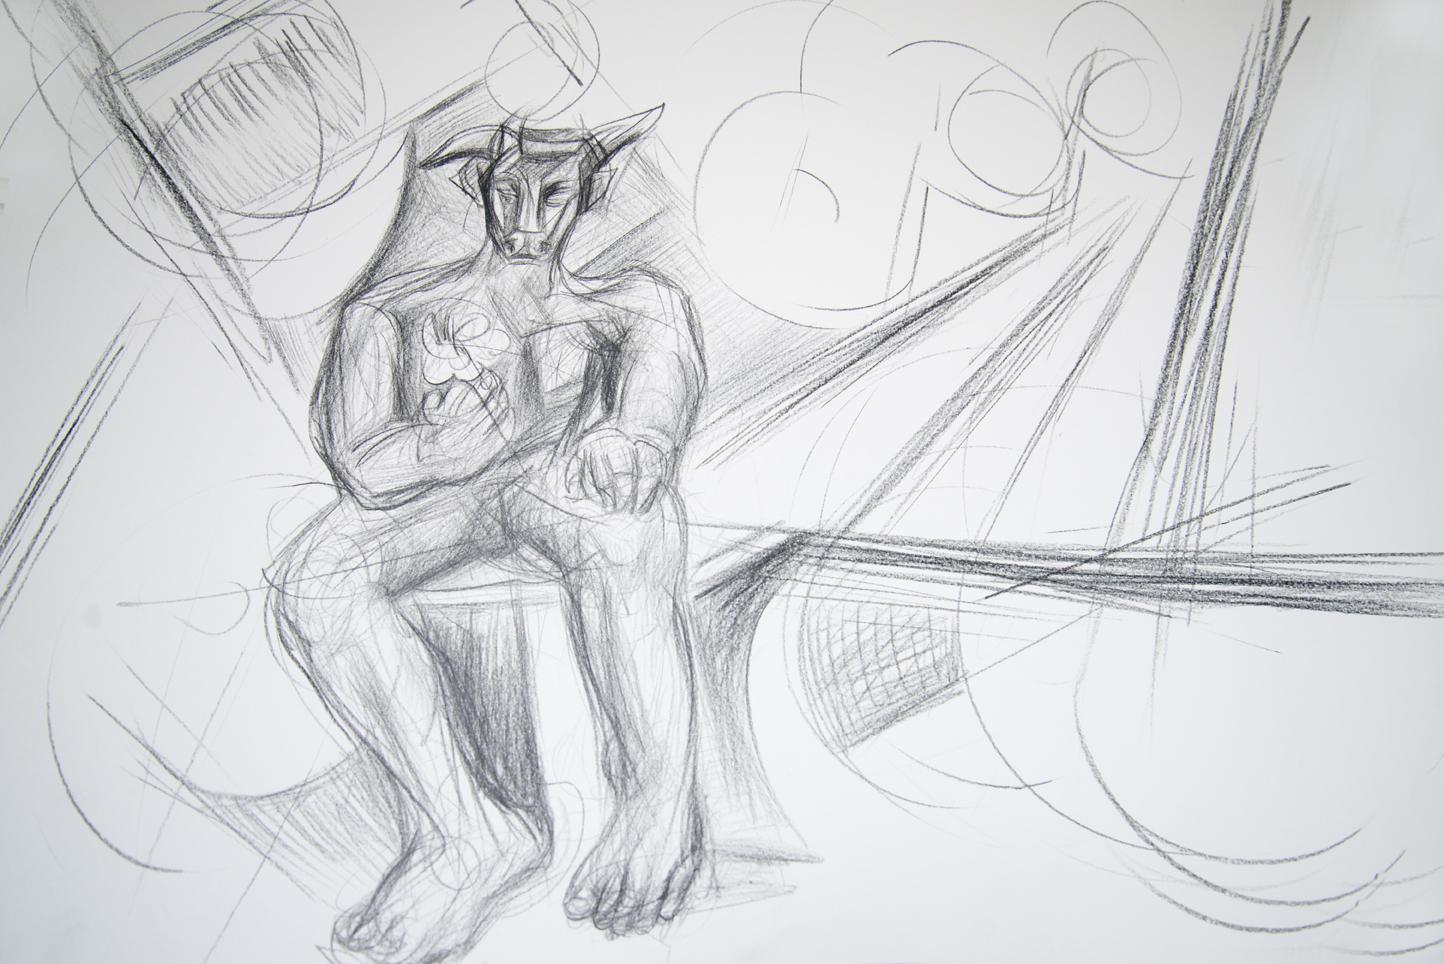 Dedalus and Minotaurus Study 3, 2015